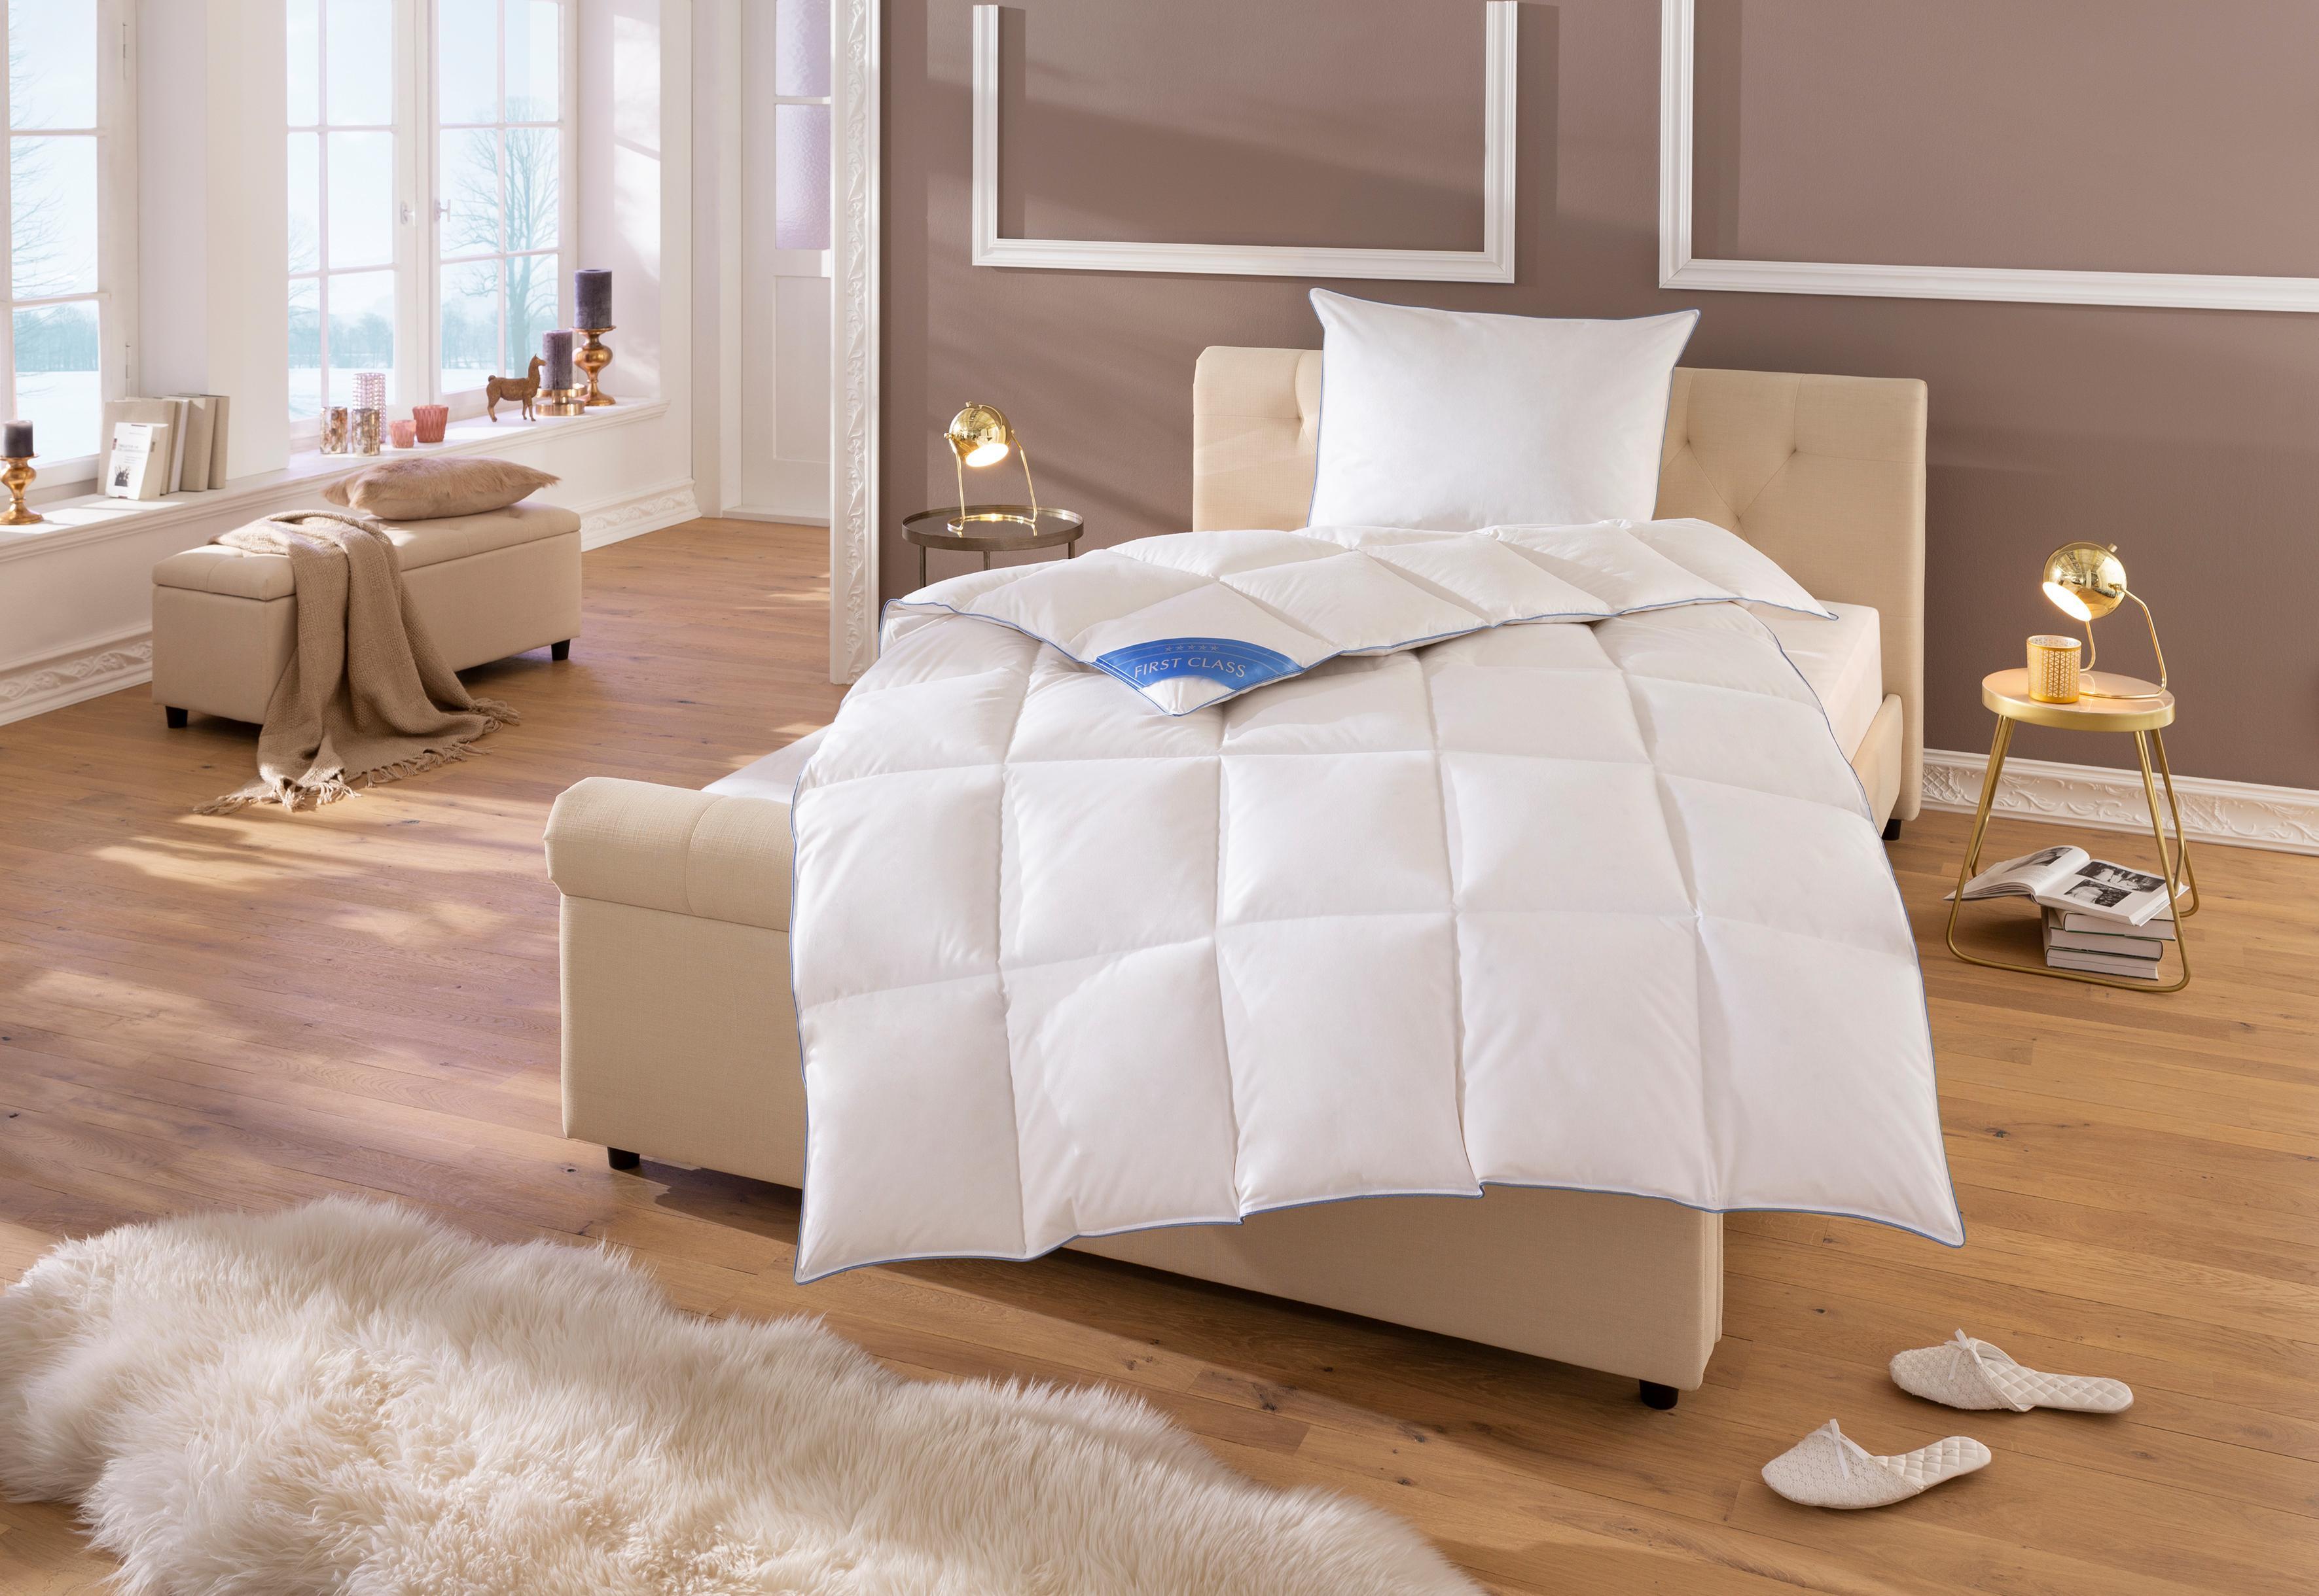 Daunenbettdecke Lina Hanse by RIBECO extrawarm Bezug: 100% Baumwolle